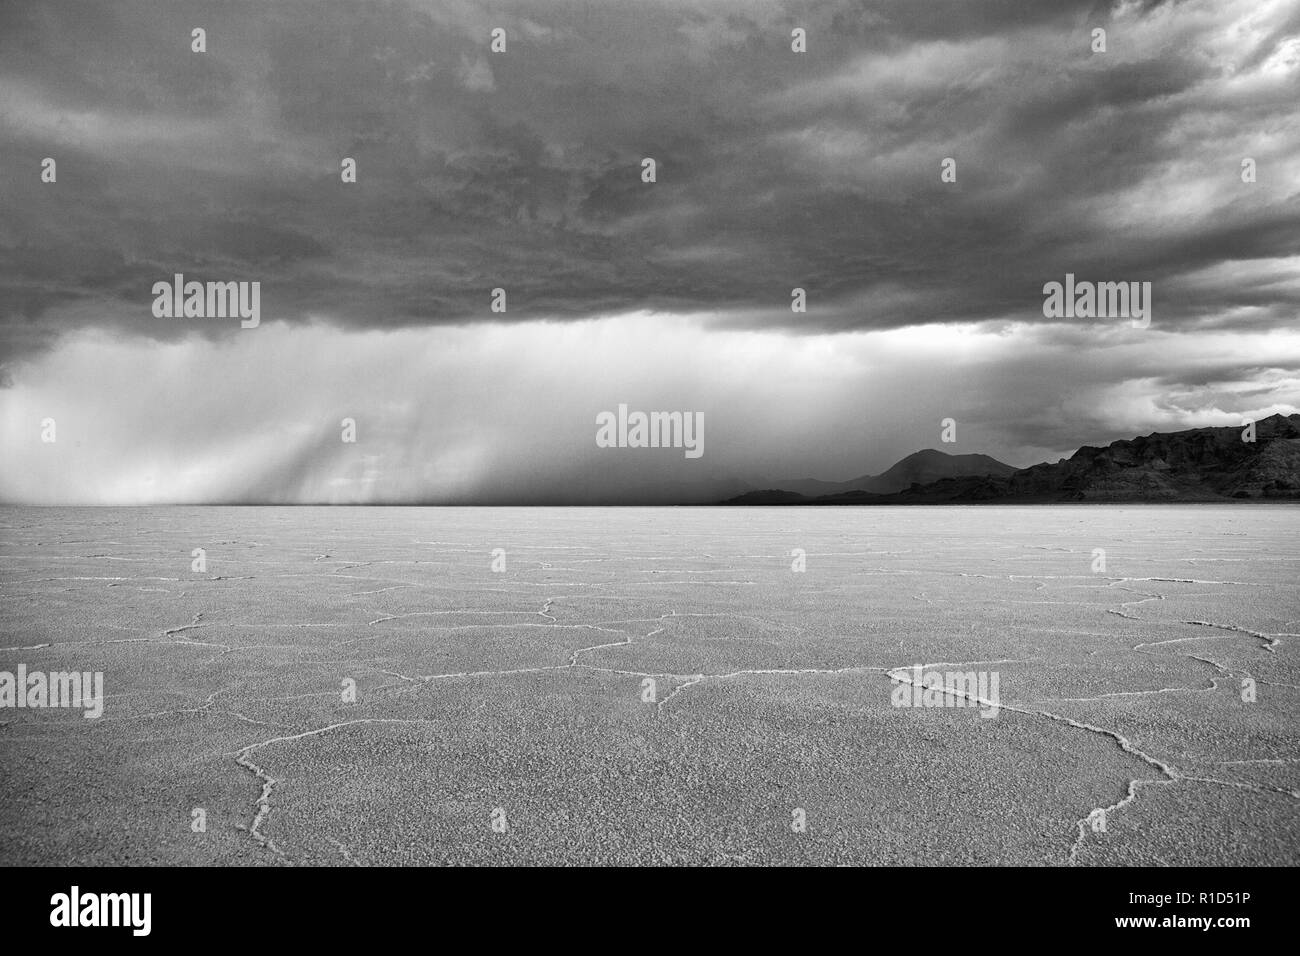 Bonneville salt flats, Utah, USA Stock Photo